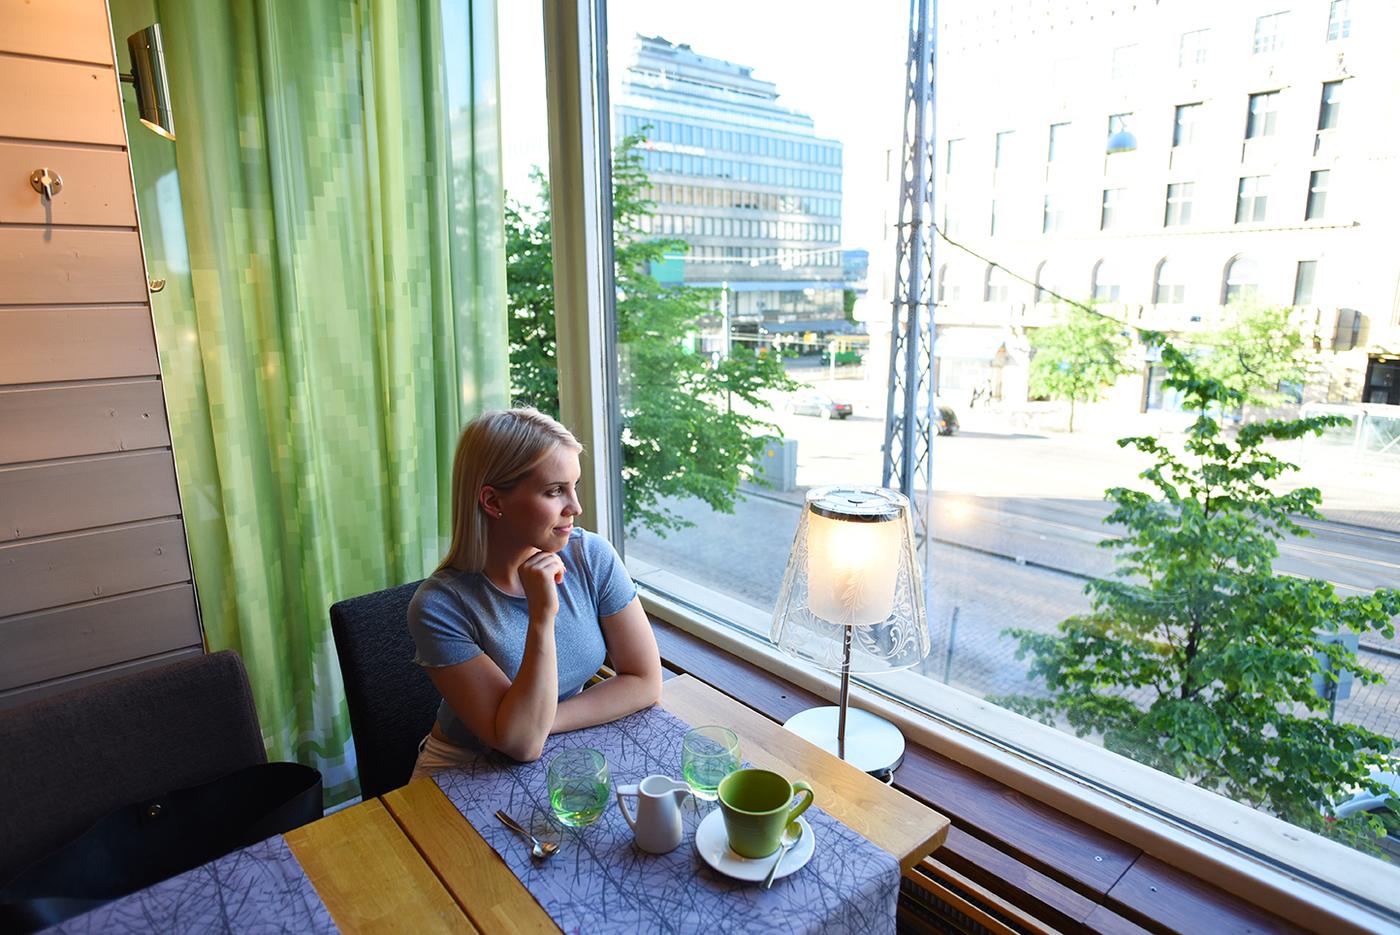 ravintola-kaarna-sok-helsinki-sundayblondie-8.jpg